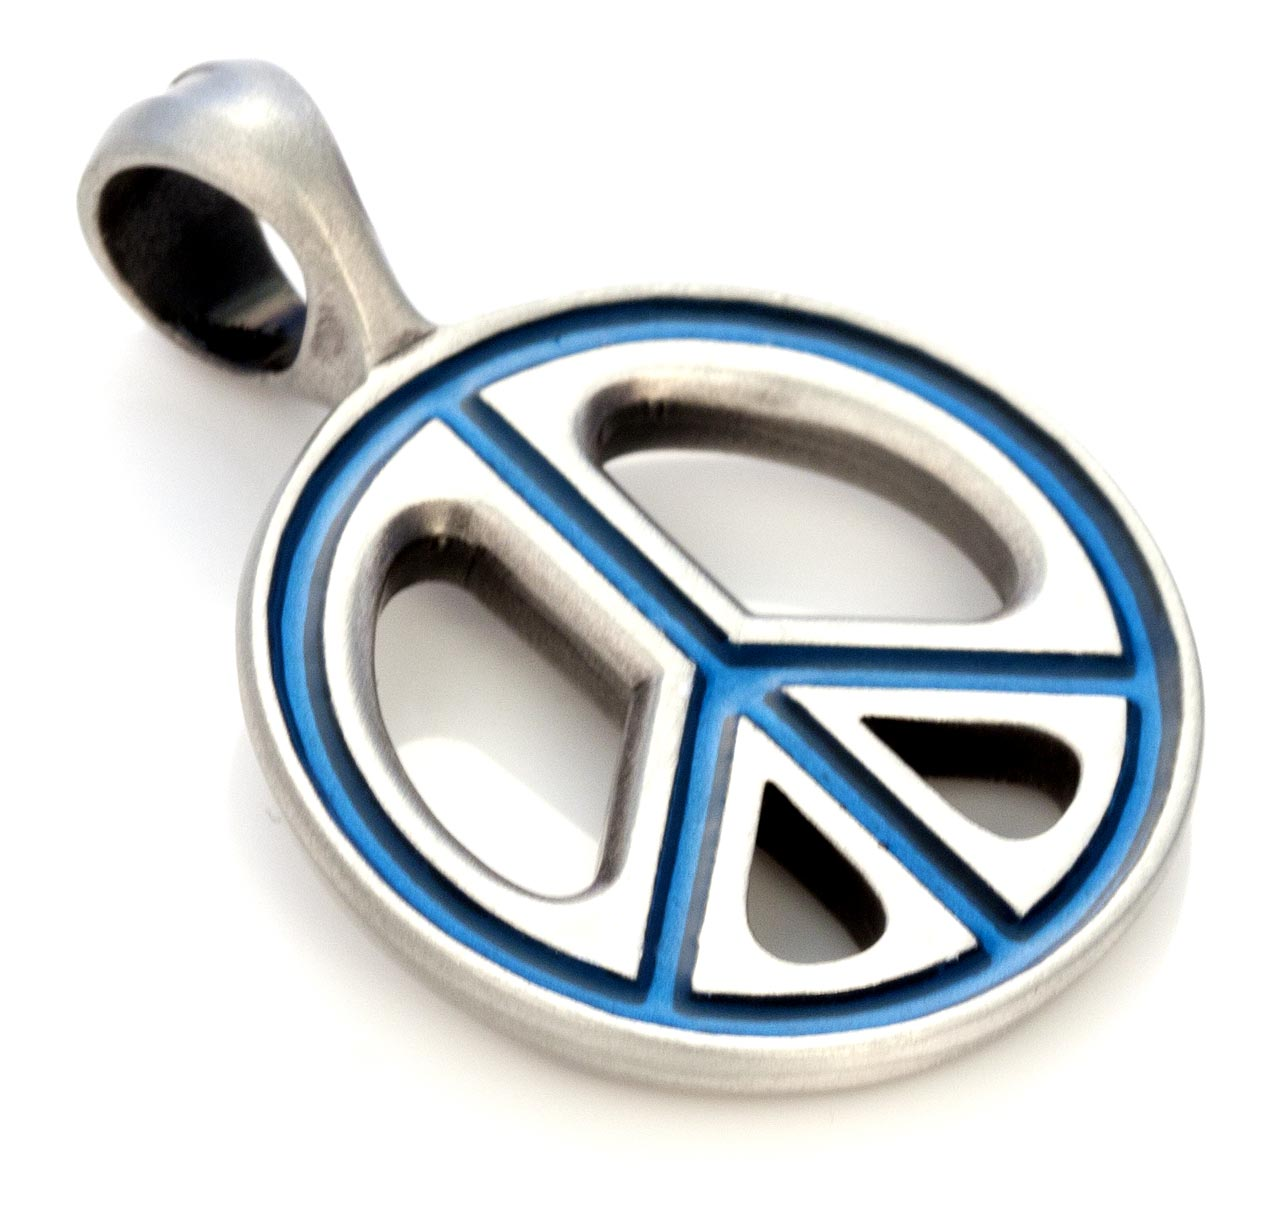 Pax - Bico Australia - silver resin pendant